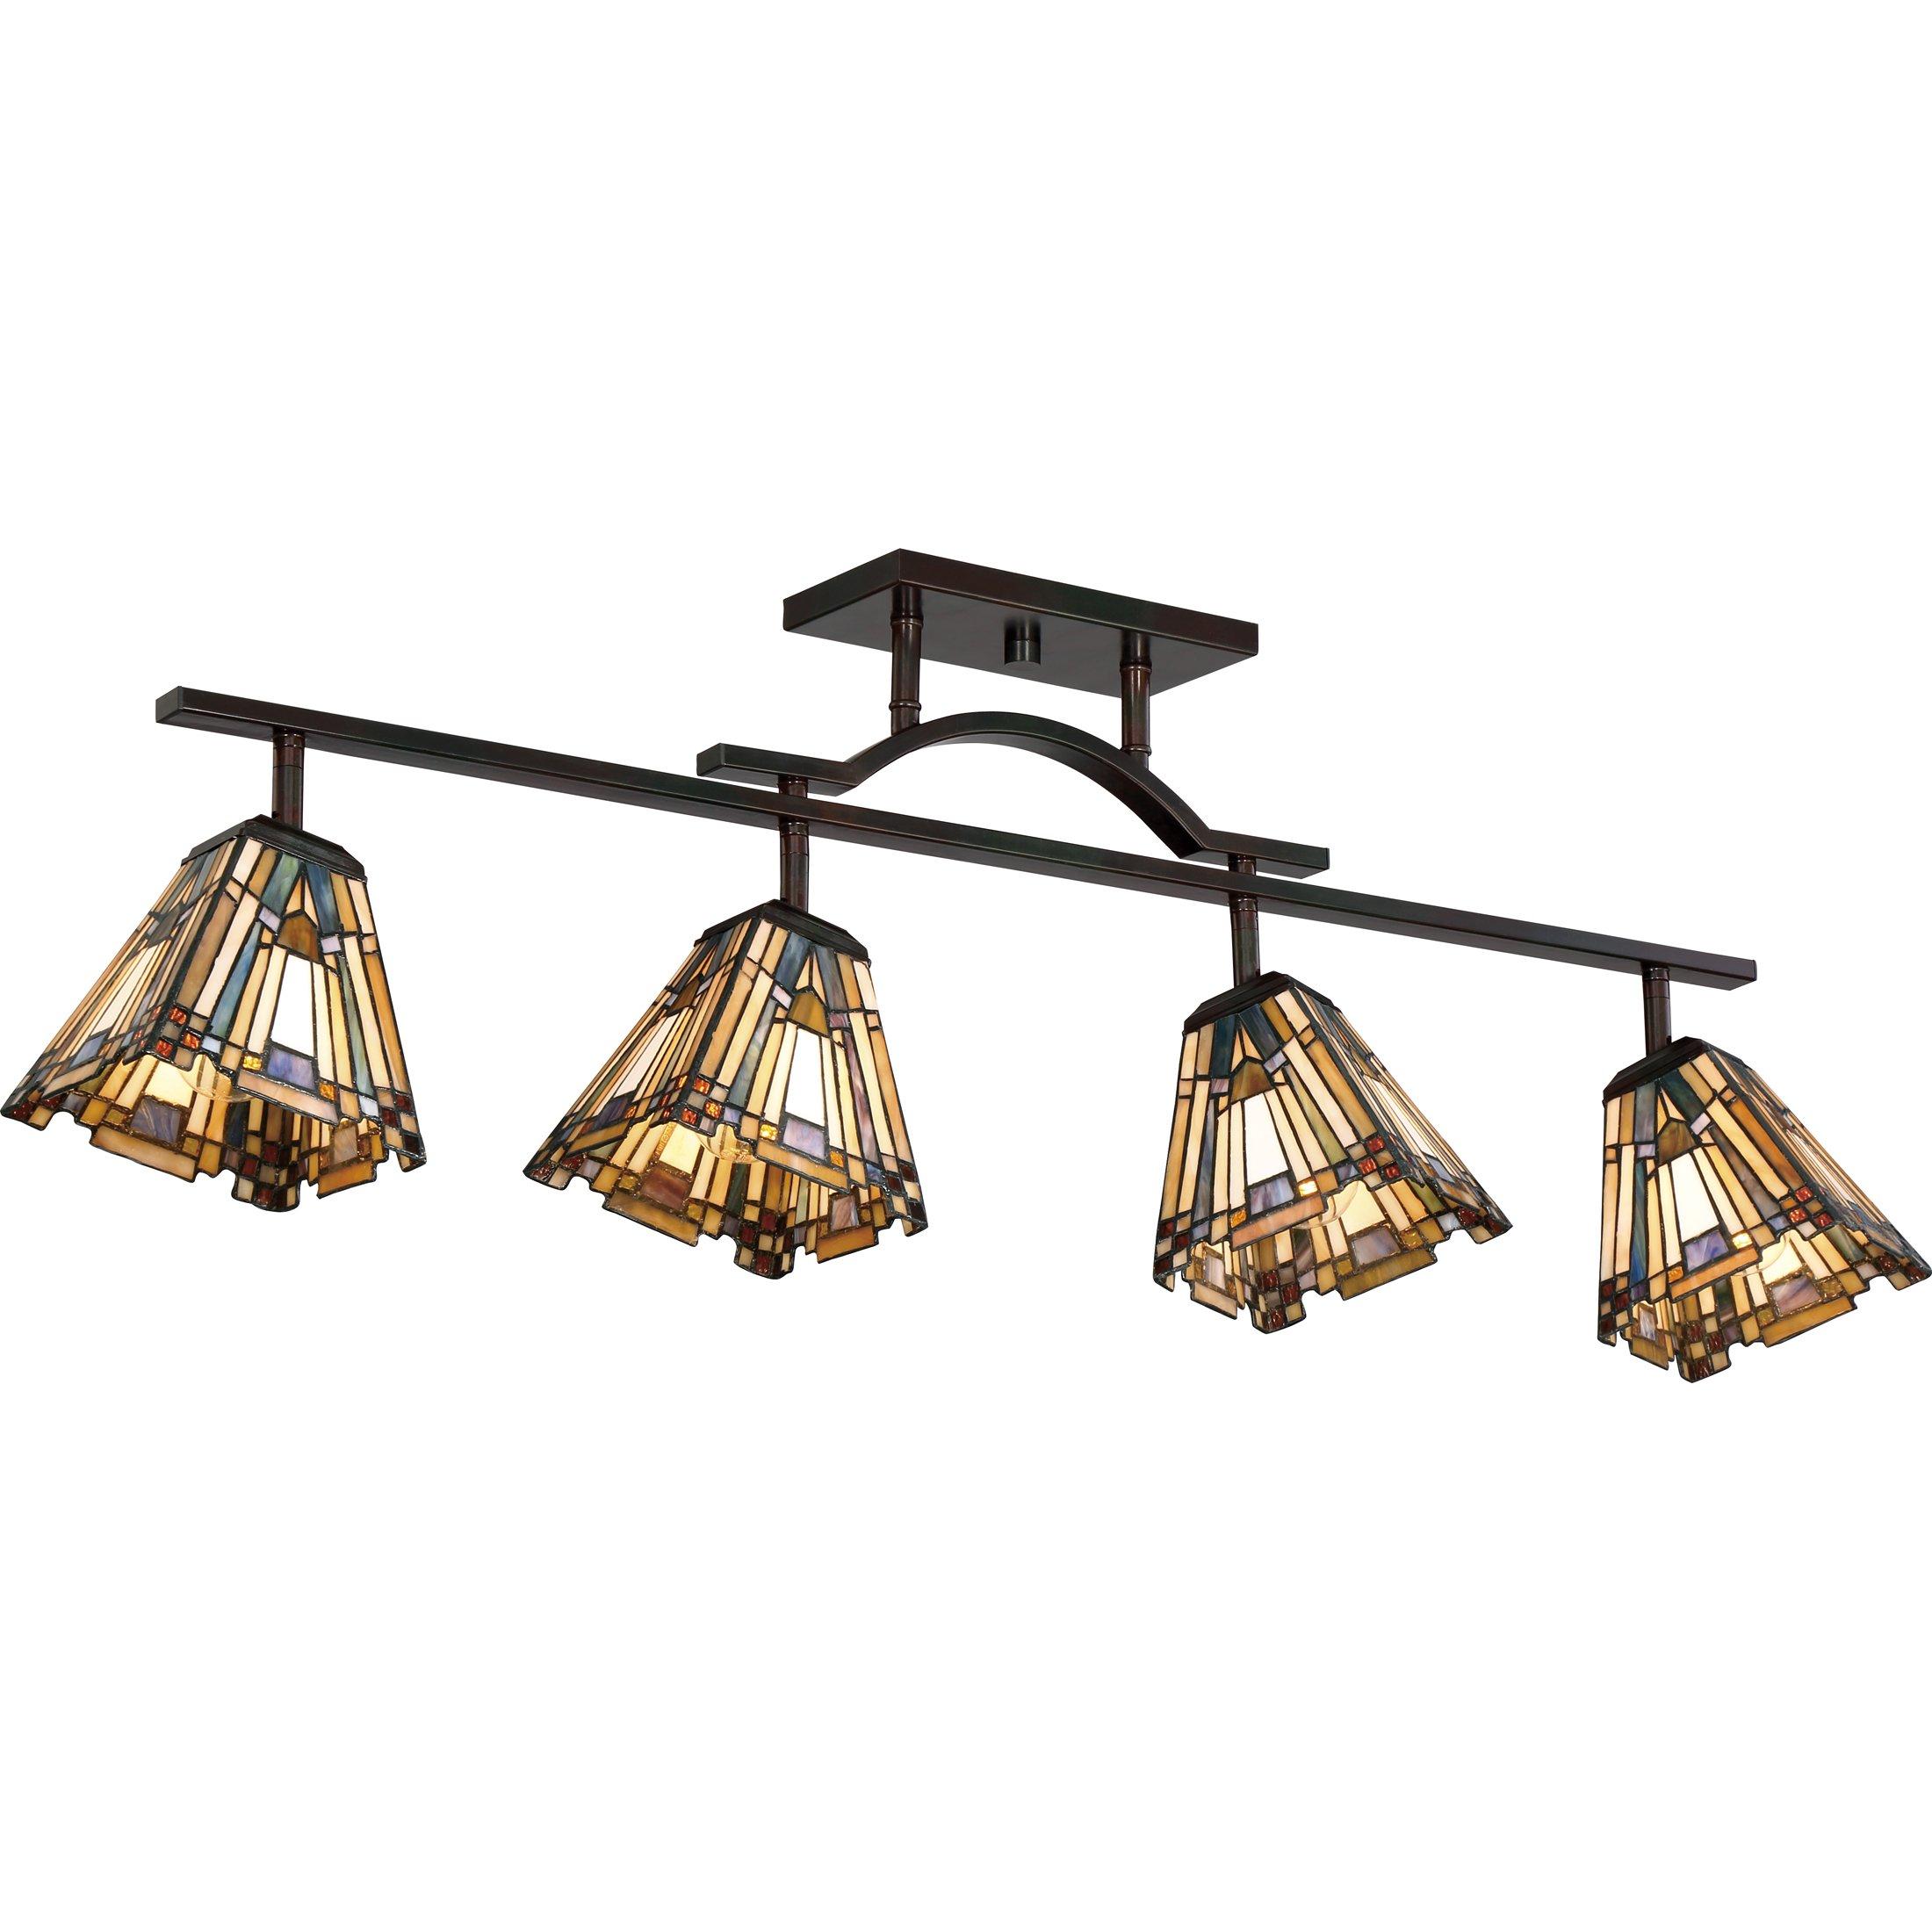 Quoizel TFIK1404VA Inglenook Adjustable Track Light Kit, 4-Light, 400 Watts, Valiant Bronze (14'' H x 42'' W)